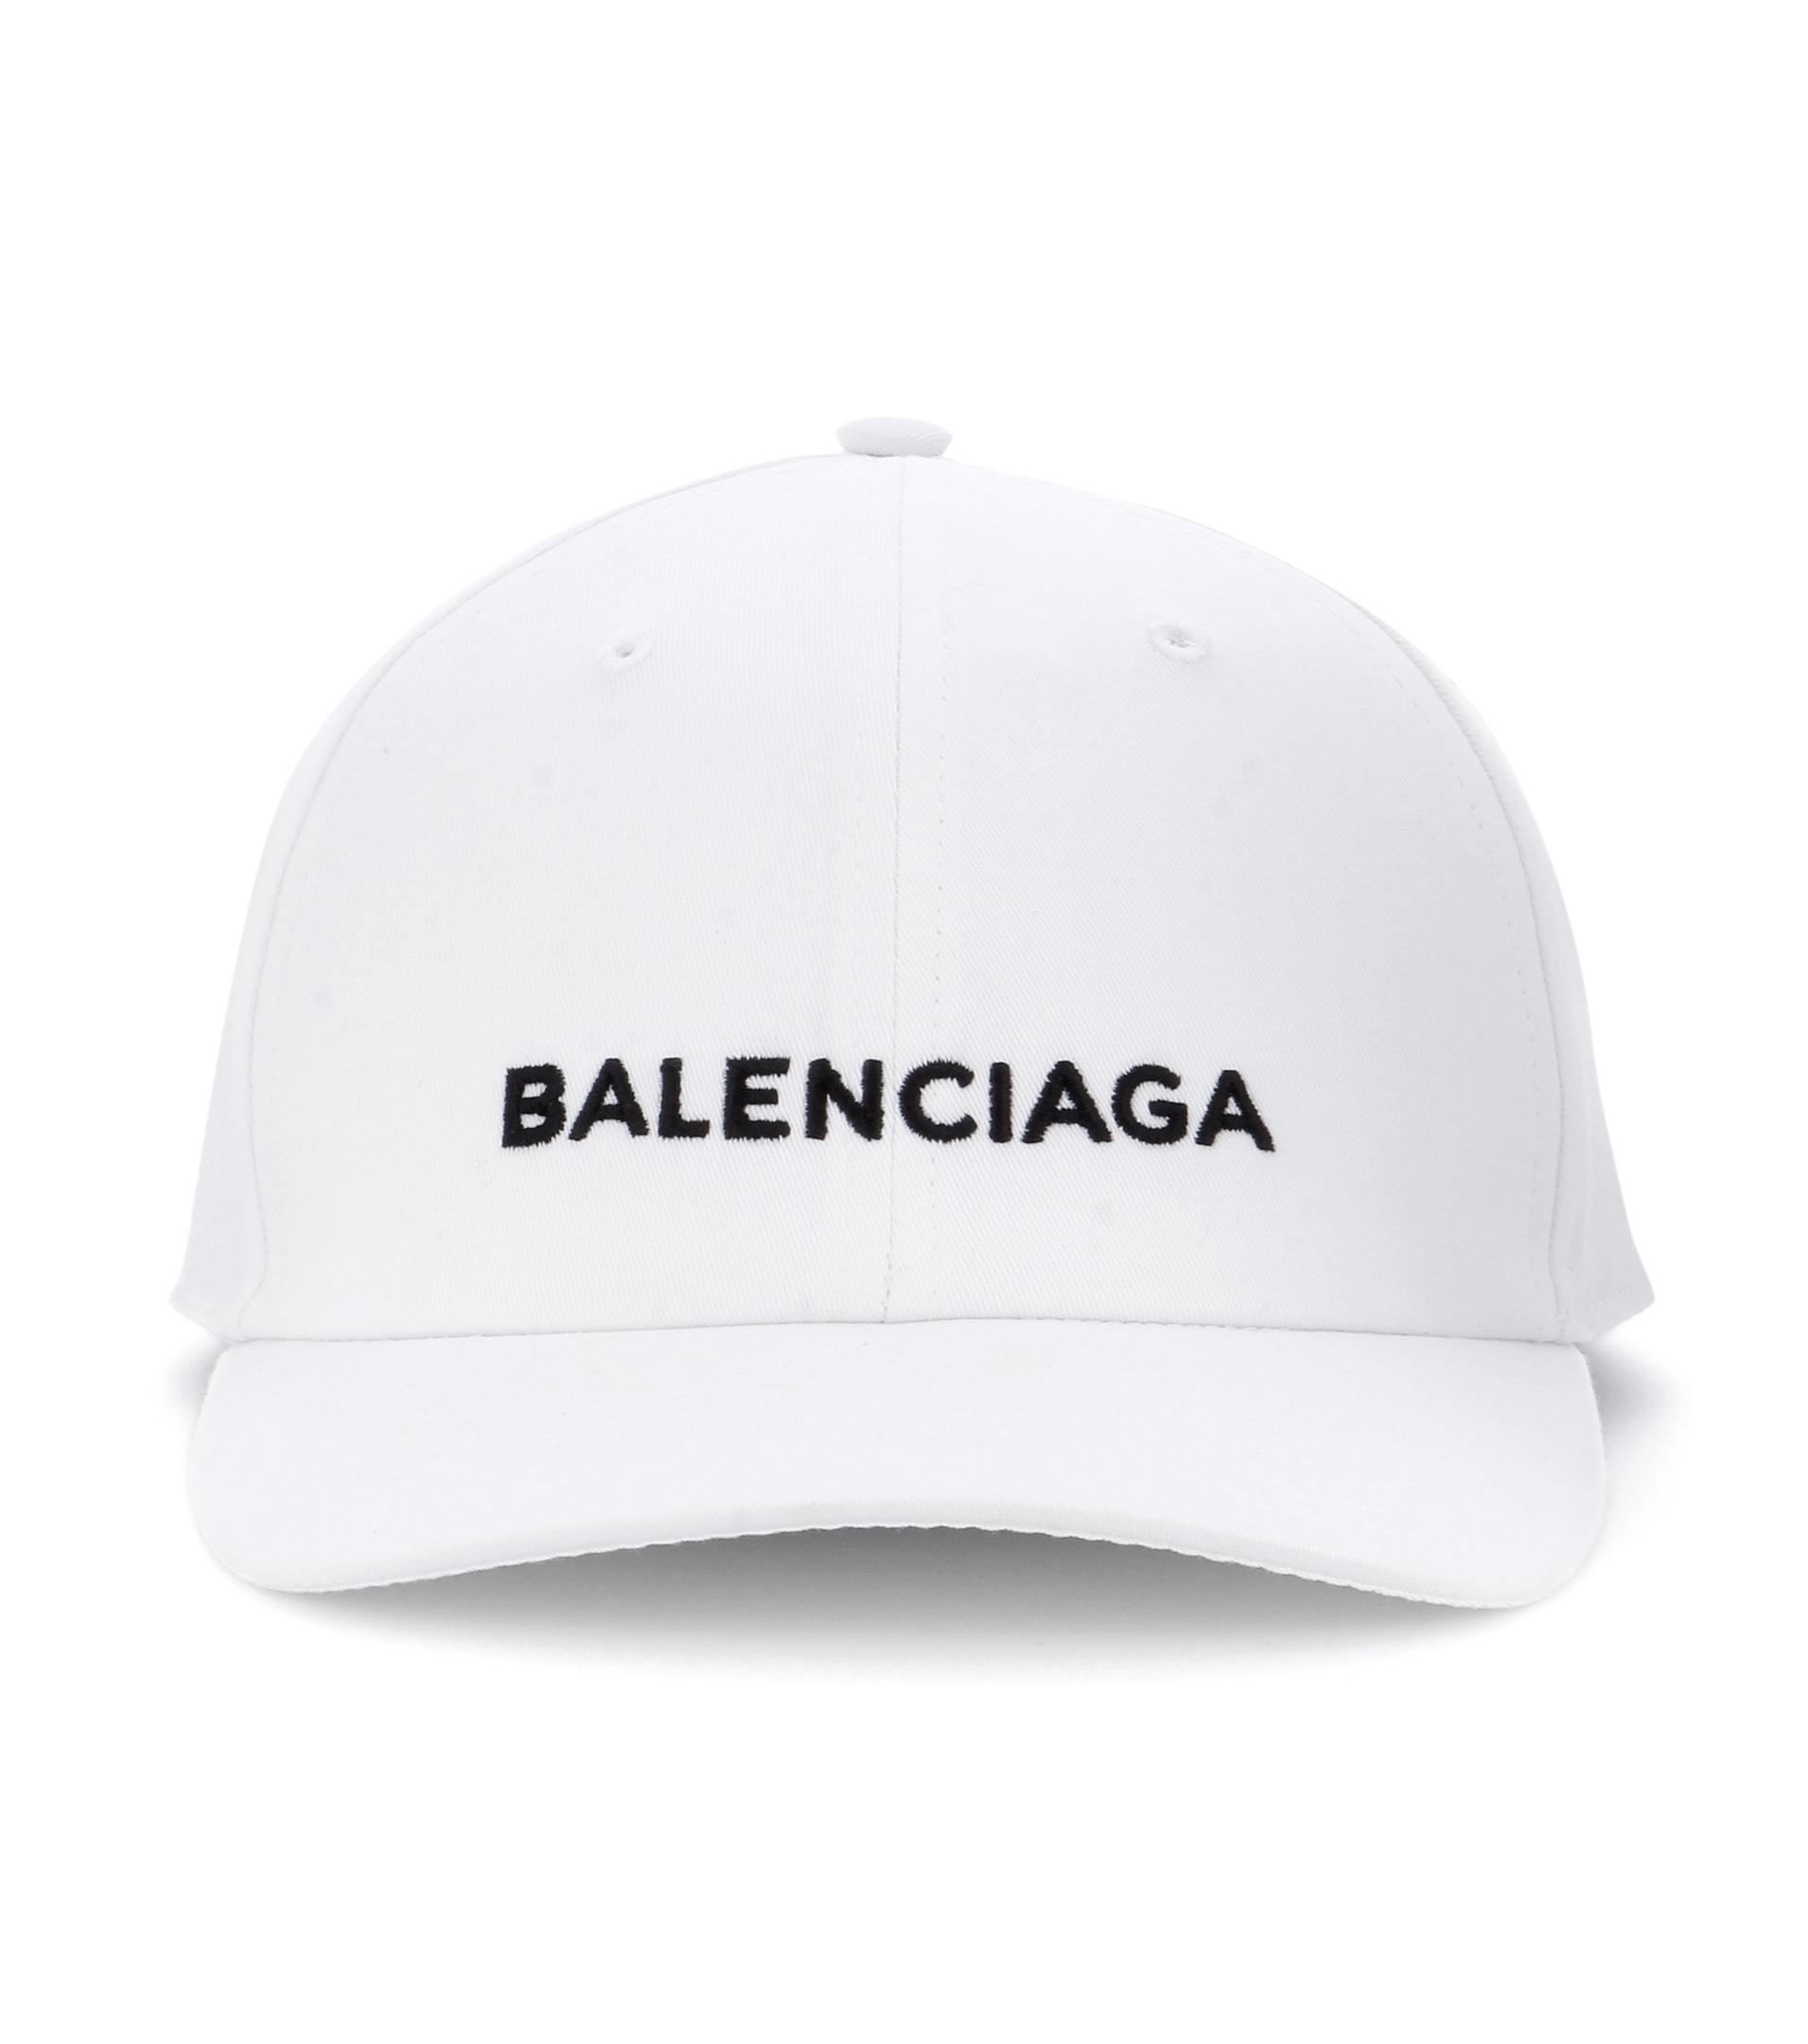 e35d4984bd481 Balenciaga Beanie Saks